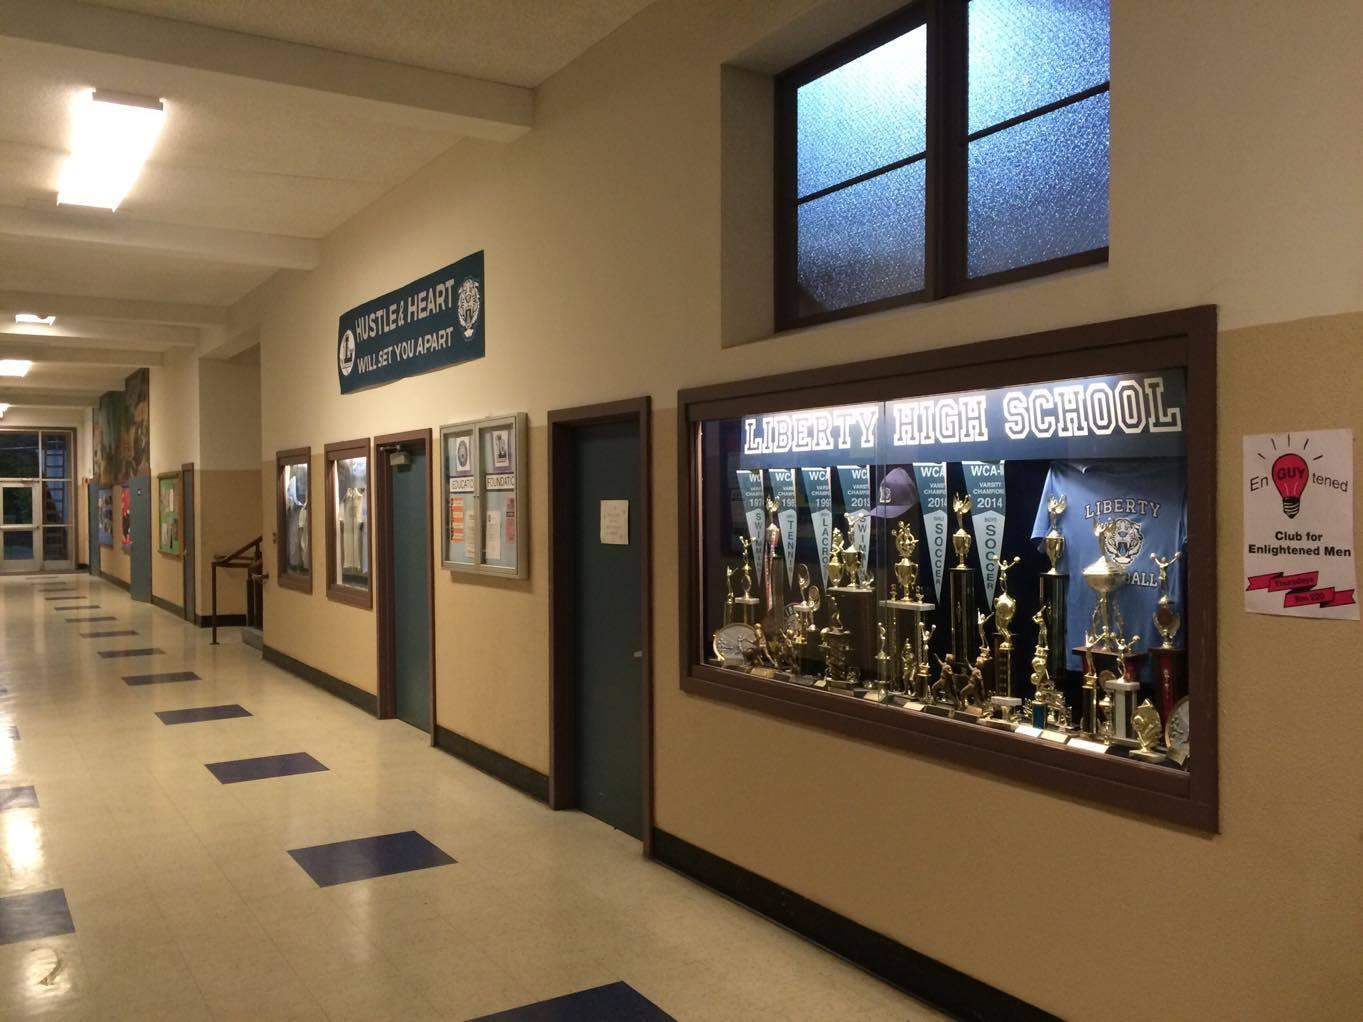 Corredor da Liberty Hall School